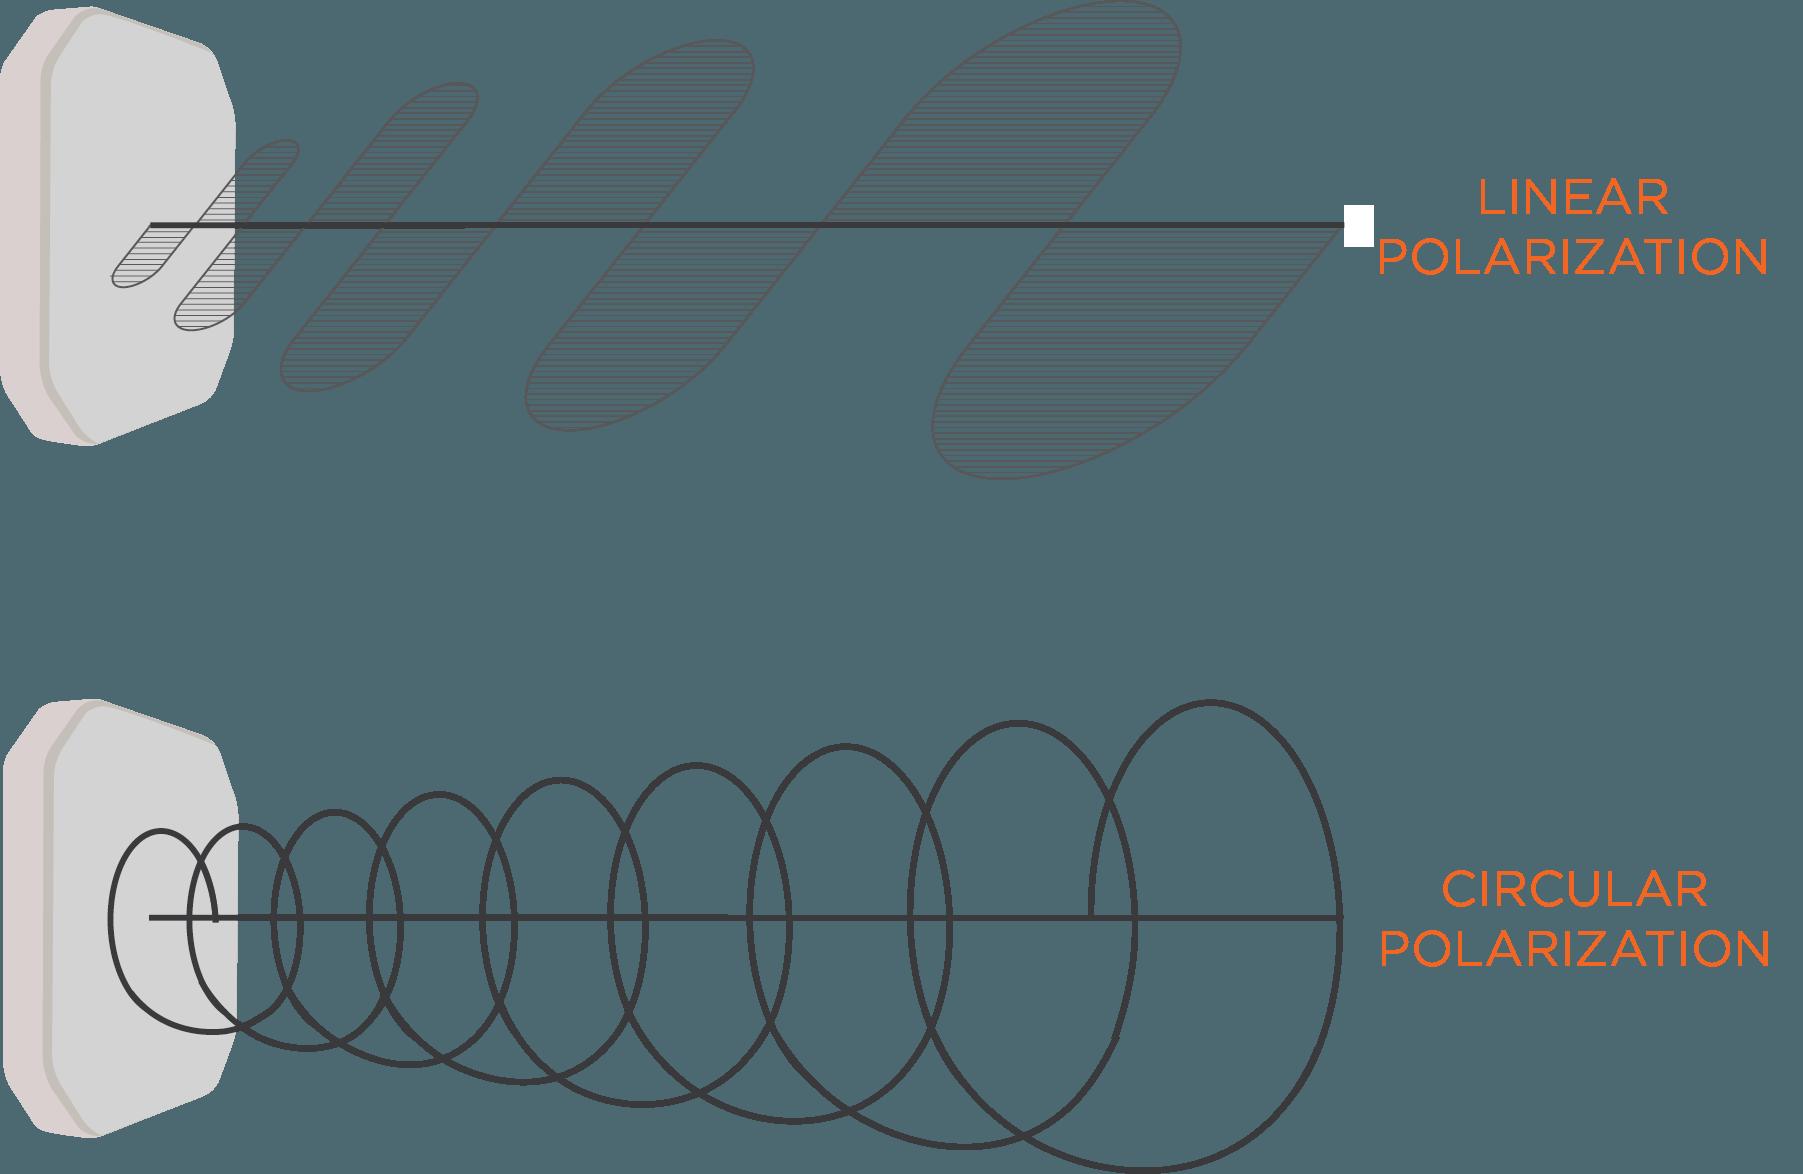 9 Tactics for Choosing an RFID Antenna - atlasRFIDstore